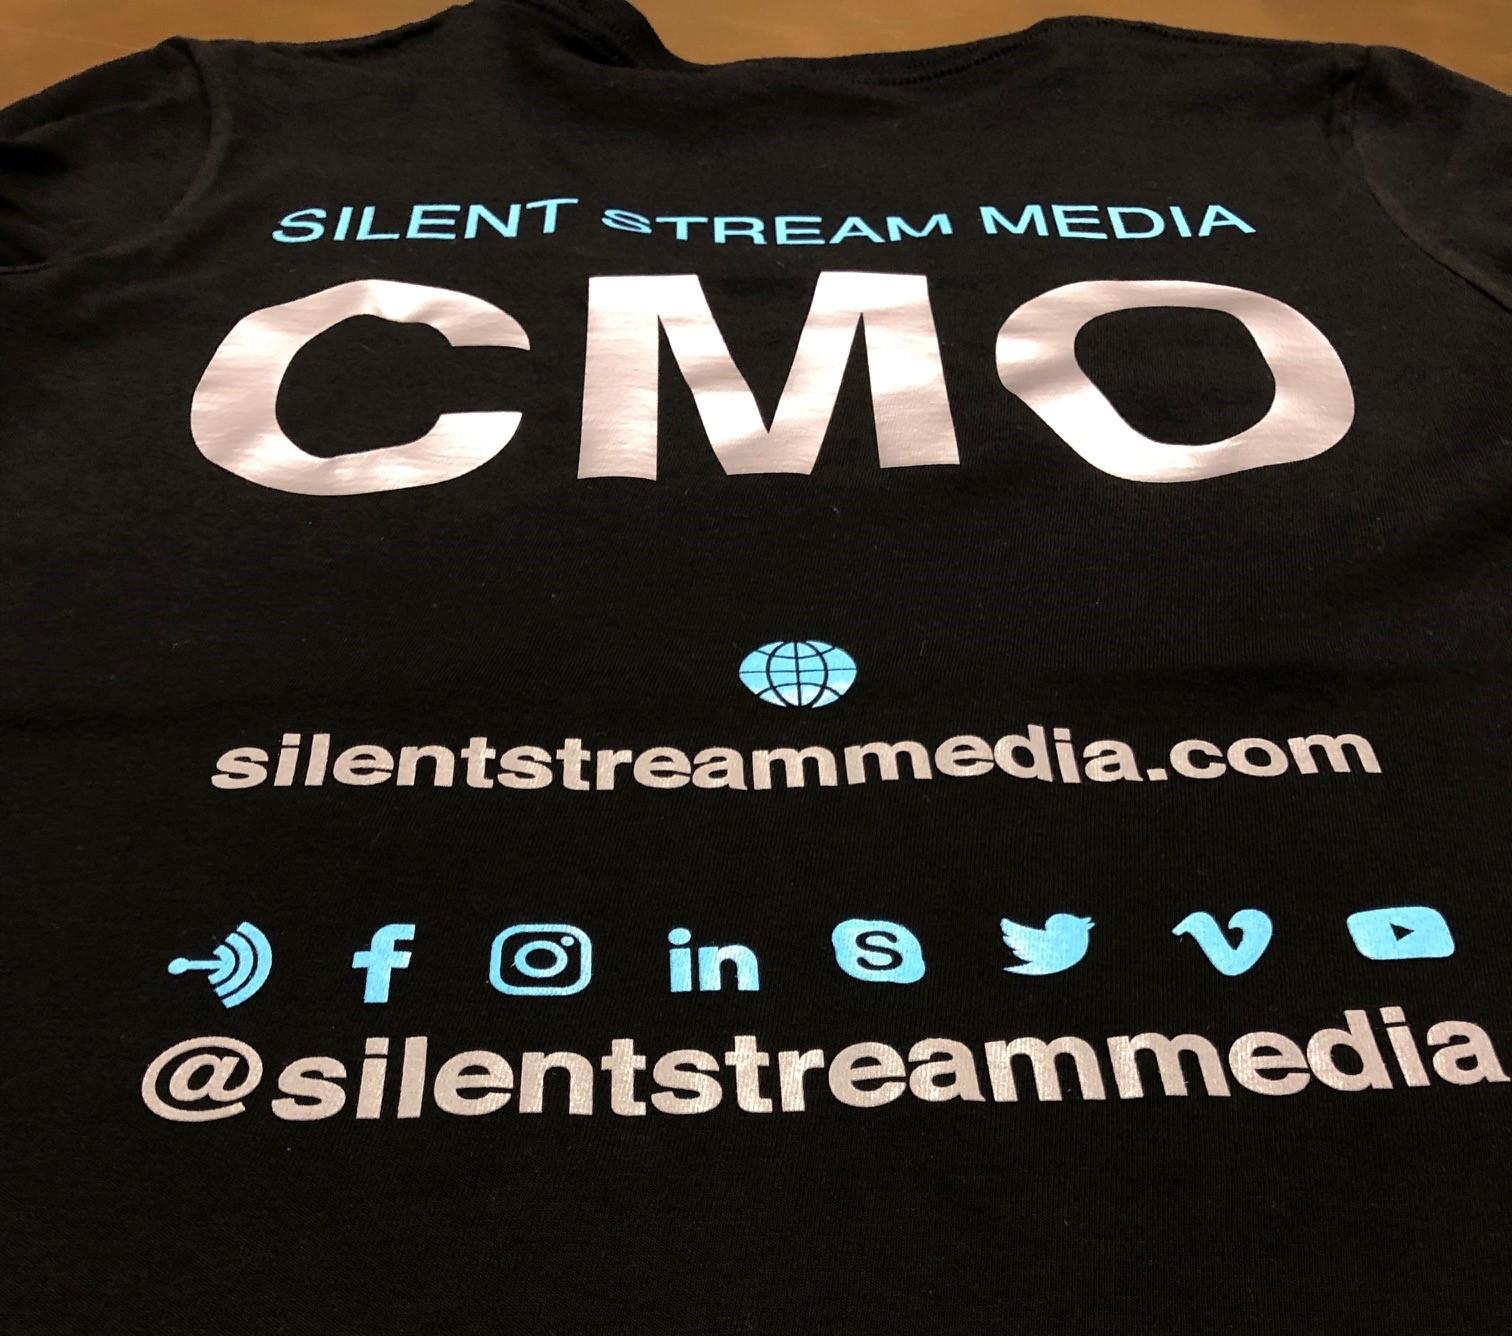 logounltd_laser_etching_embroidery_screen_printing_apparel_uniform_custom_tshirts_t_shirt_kirkland_bellevue_seattle_redmond_woodinville_branded_merchandise_promotional_products_logo_unltd_silent_stream_meadia (1).jpg